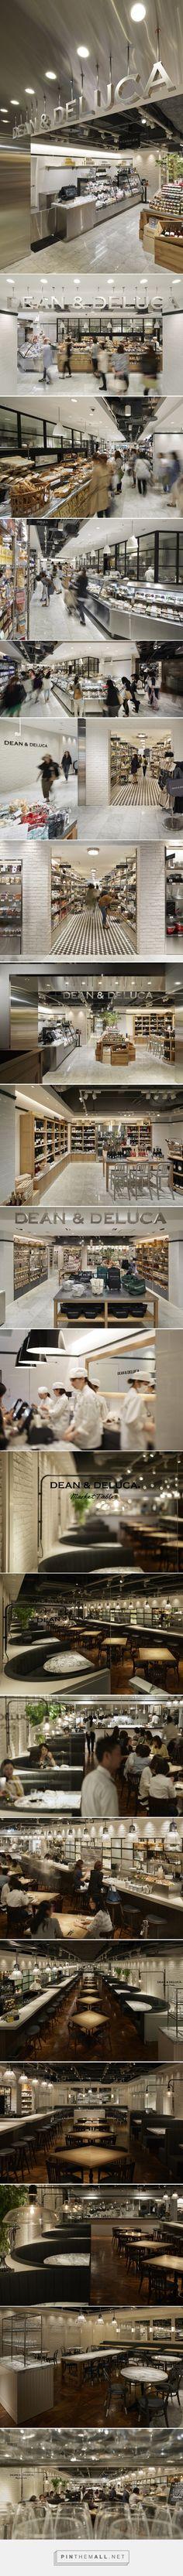 DEAN & DELUCA FUKUOKA | Wonderwall - created via http://pinthemall.net